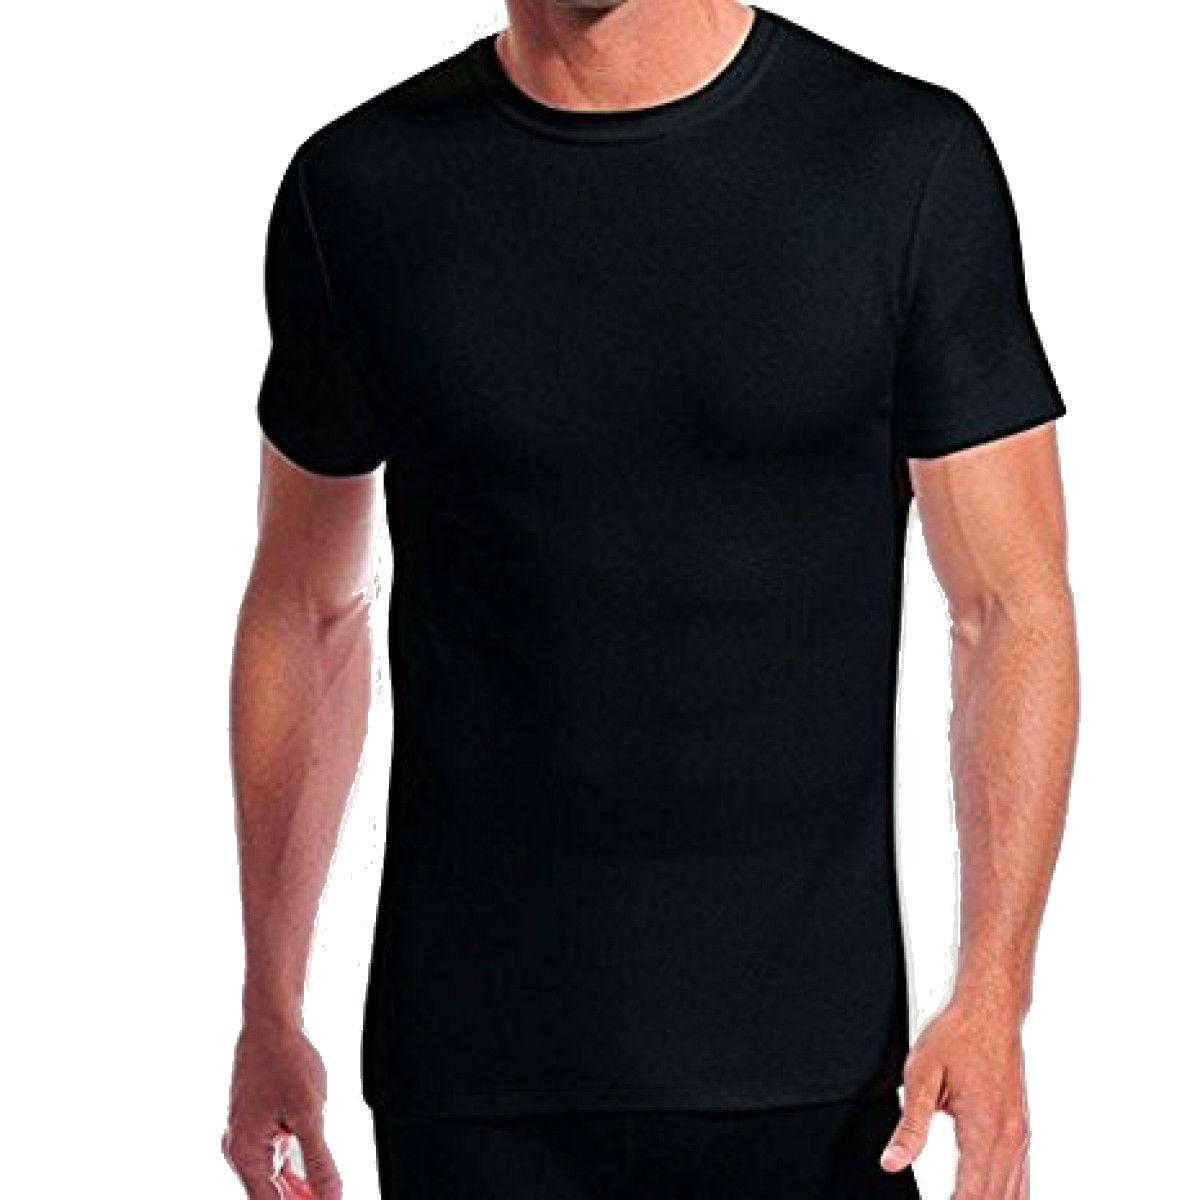 98a541b7c990 -10% T-shirt ισοθερμικό Jockey thermal 15501812 - Μαύρο Ανδρικά